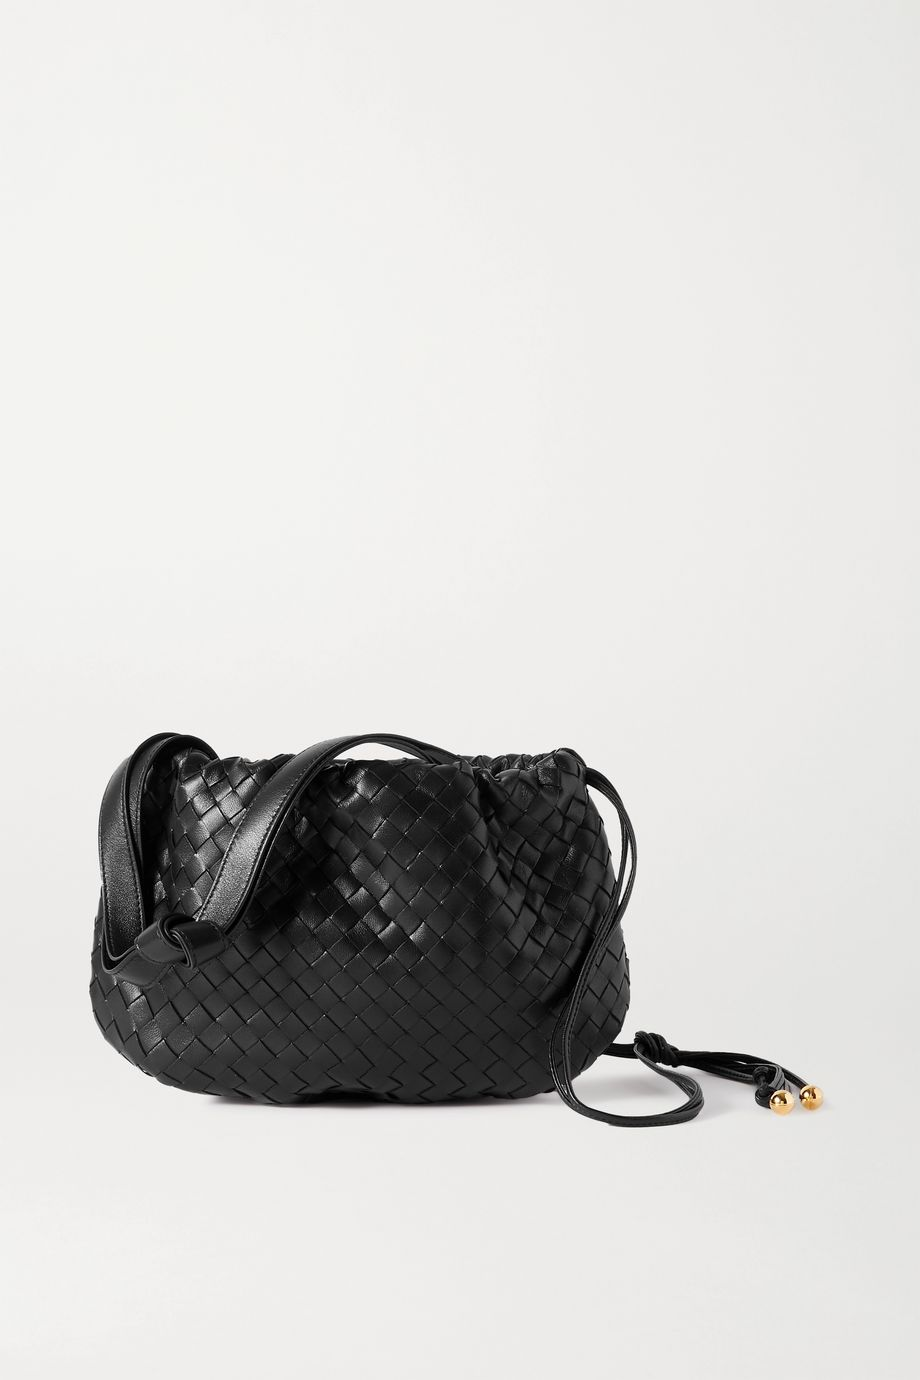 Bottega Veneta Sac porté épaule en cuir intrecciato à fronces The Small Bulb